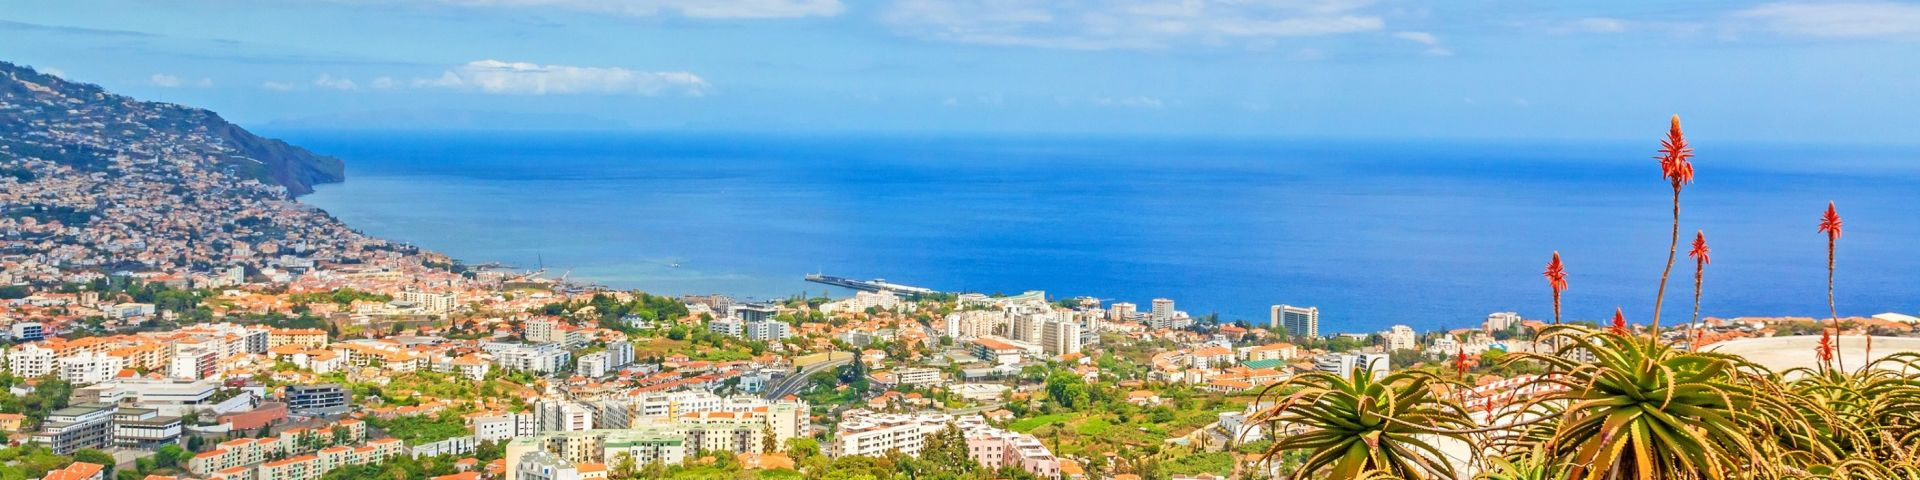 Madeira - Die Insel des ewigen Frühlings